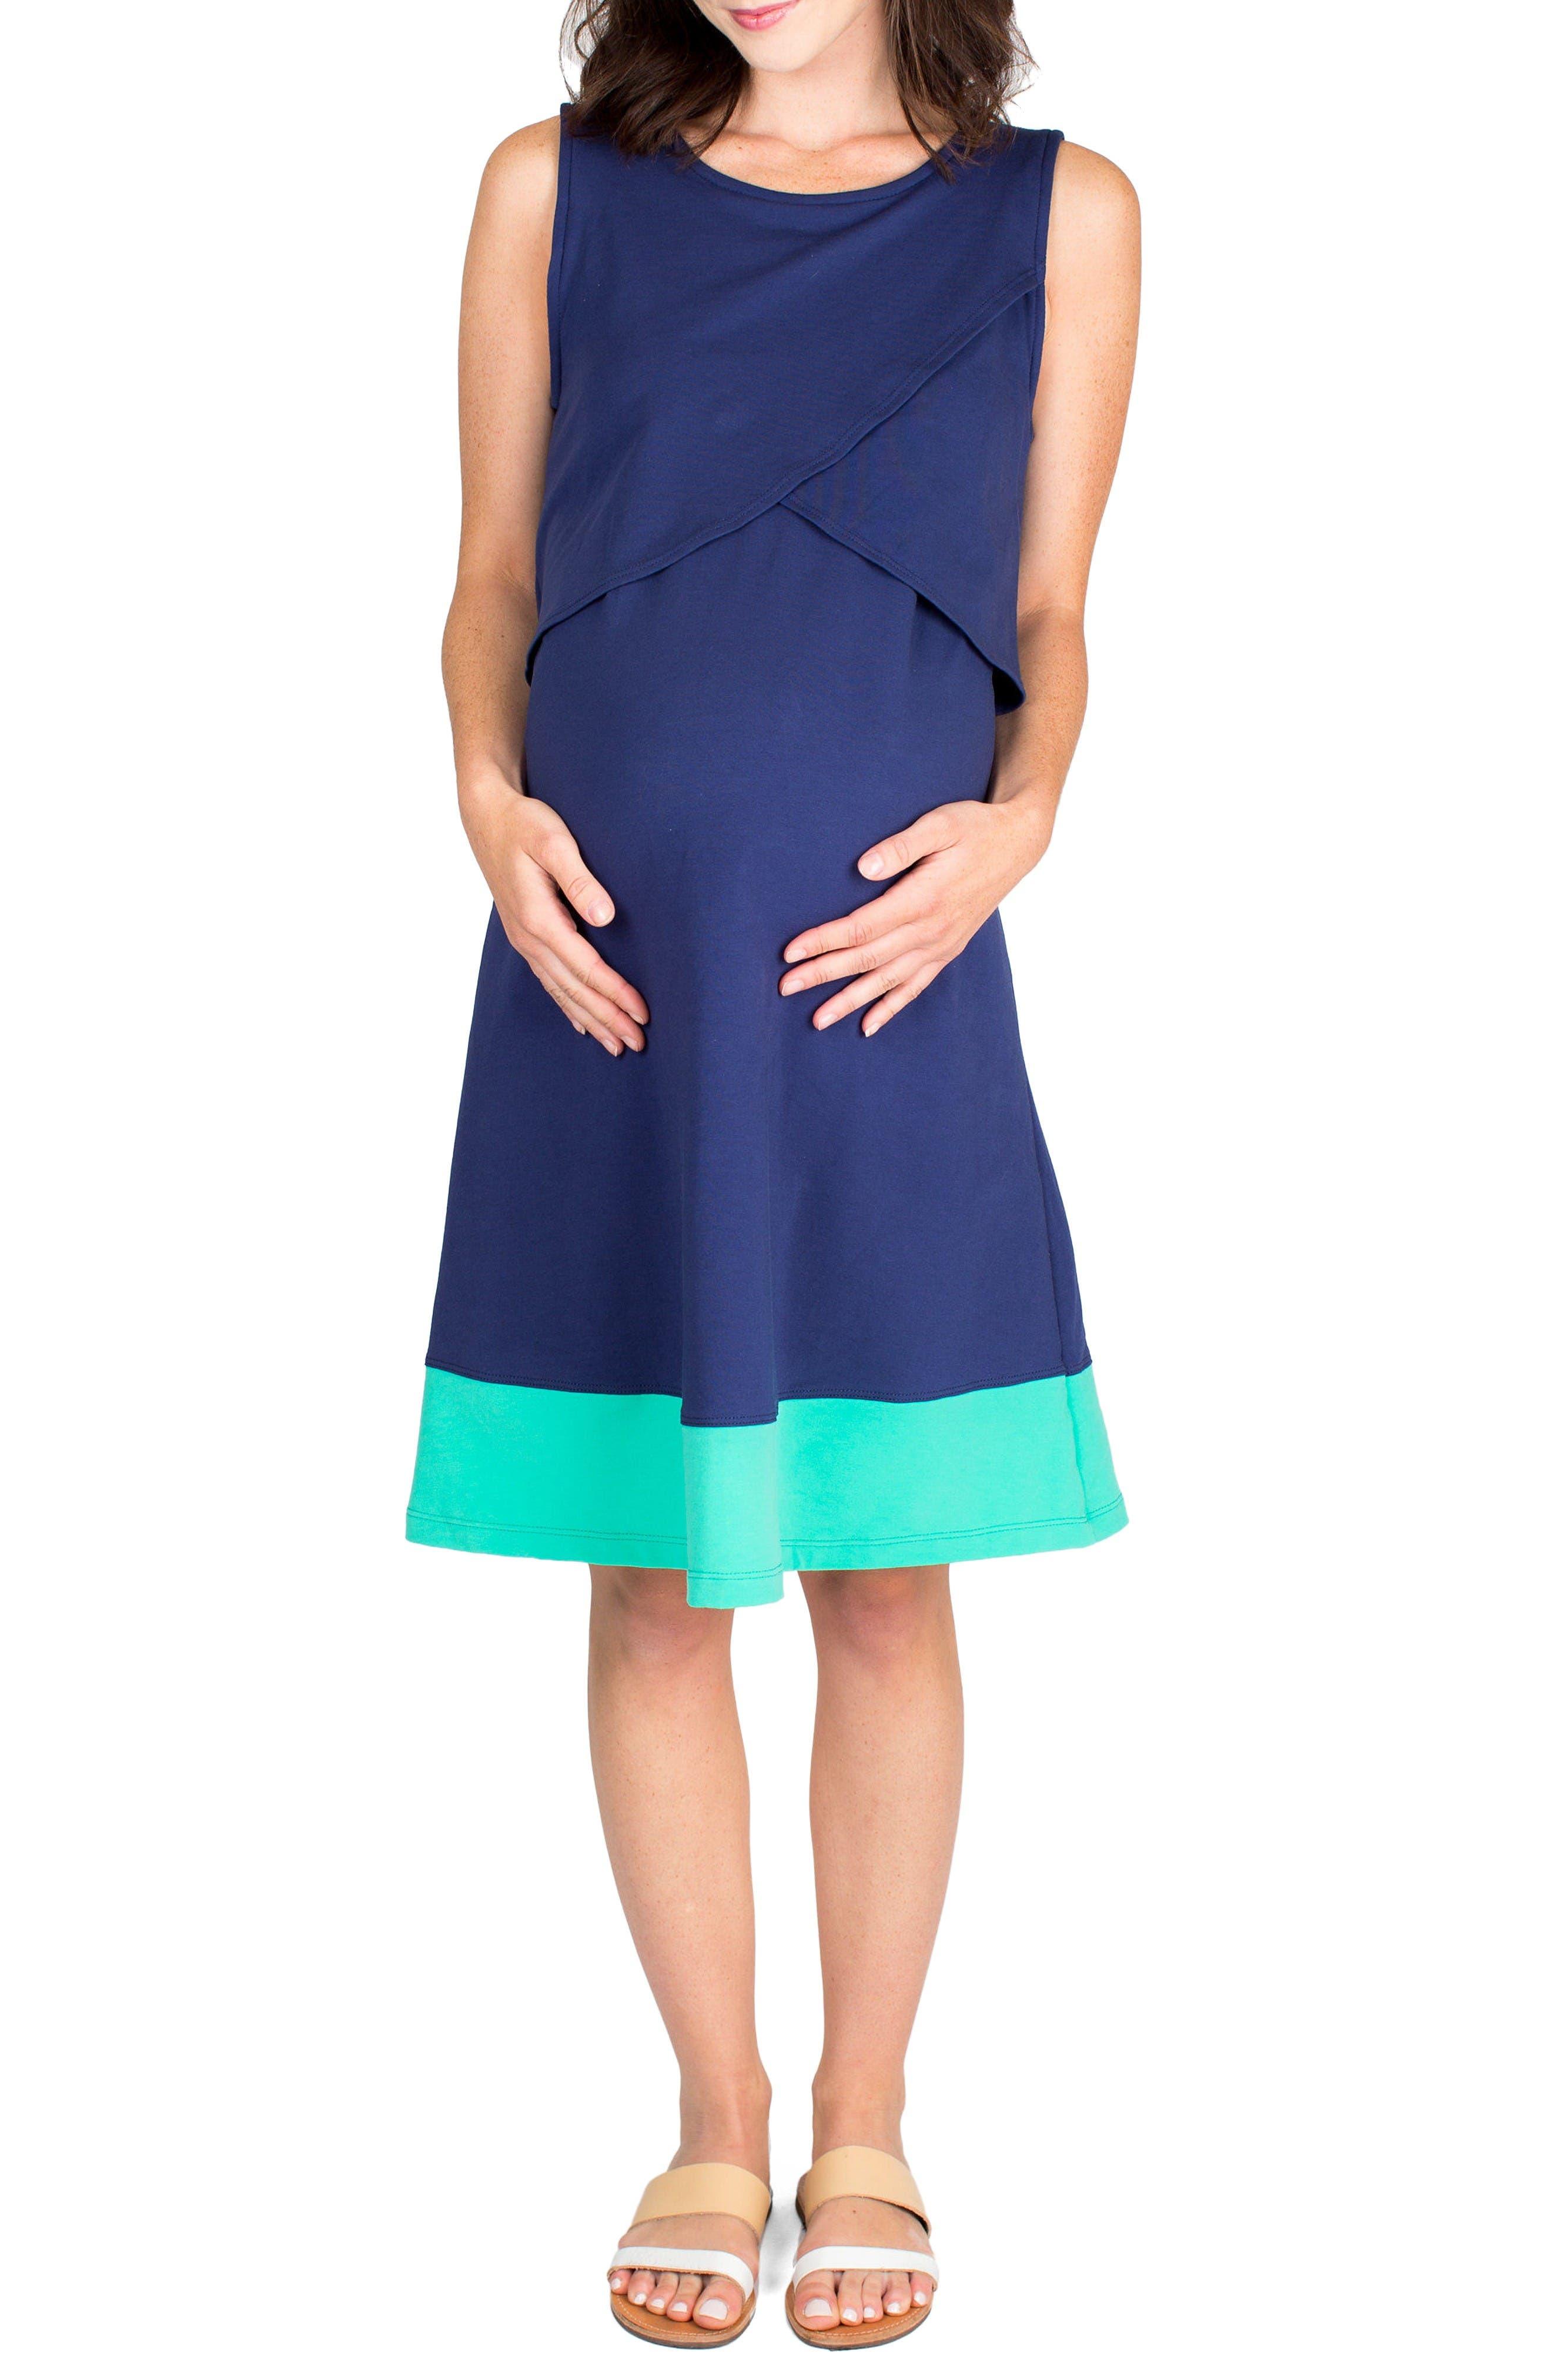 Alternate Image 1 Selected - Nom Maternity Sophia Maternity/Nursing Dress